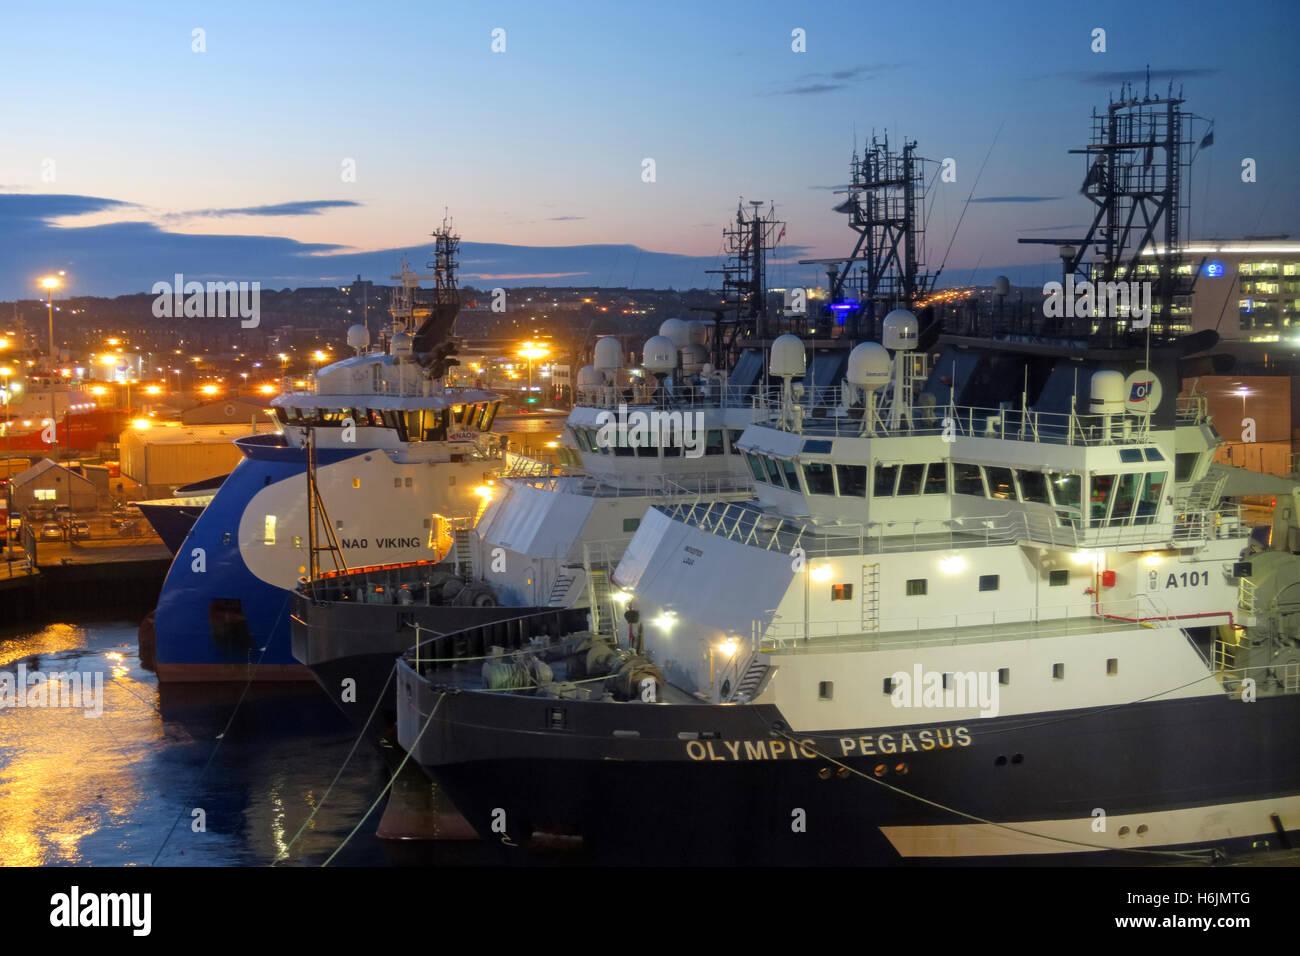 Ship,shipping,boat,ferry,ferries,oil,town,city,centre,lights,dusk,blue,hour,dock,docks,dockside,crane,cranes,reflection,reflections,Scotish,Scottish,Alba,business,cargo,commercial,coastal,economy,europe,european,gas,Northsea,sea,haven,supply,vessel,AB11,City Centre,Blue Hour,North Sea,GoTonySmith,@HotpixUK,Tony,Smith,UK,GB,Great,Britain,United,Kingdom,English,British,England,AberdeenHarbour,Harbor,carpark,car,park,twilight,lowlight,low,light,lowlight,low,light,Olympic,Pegasus,Offshore,Supply,Ship,IMO,9257929,IMO9257929,MMSI,257174000,fleet,marine,traffic,Norway,NAO,Viking,9722522,IMO9722522,Buy Pictures of,Buy Images Of,Images of,Stock Images,Tony Smith,United Kingdom,Great Britain,British Isles,Aberdeen Harbour,Olympic Pegasus,Offshore Supply Ship,NAO Viking